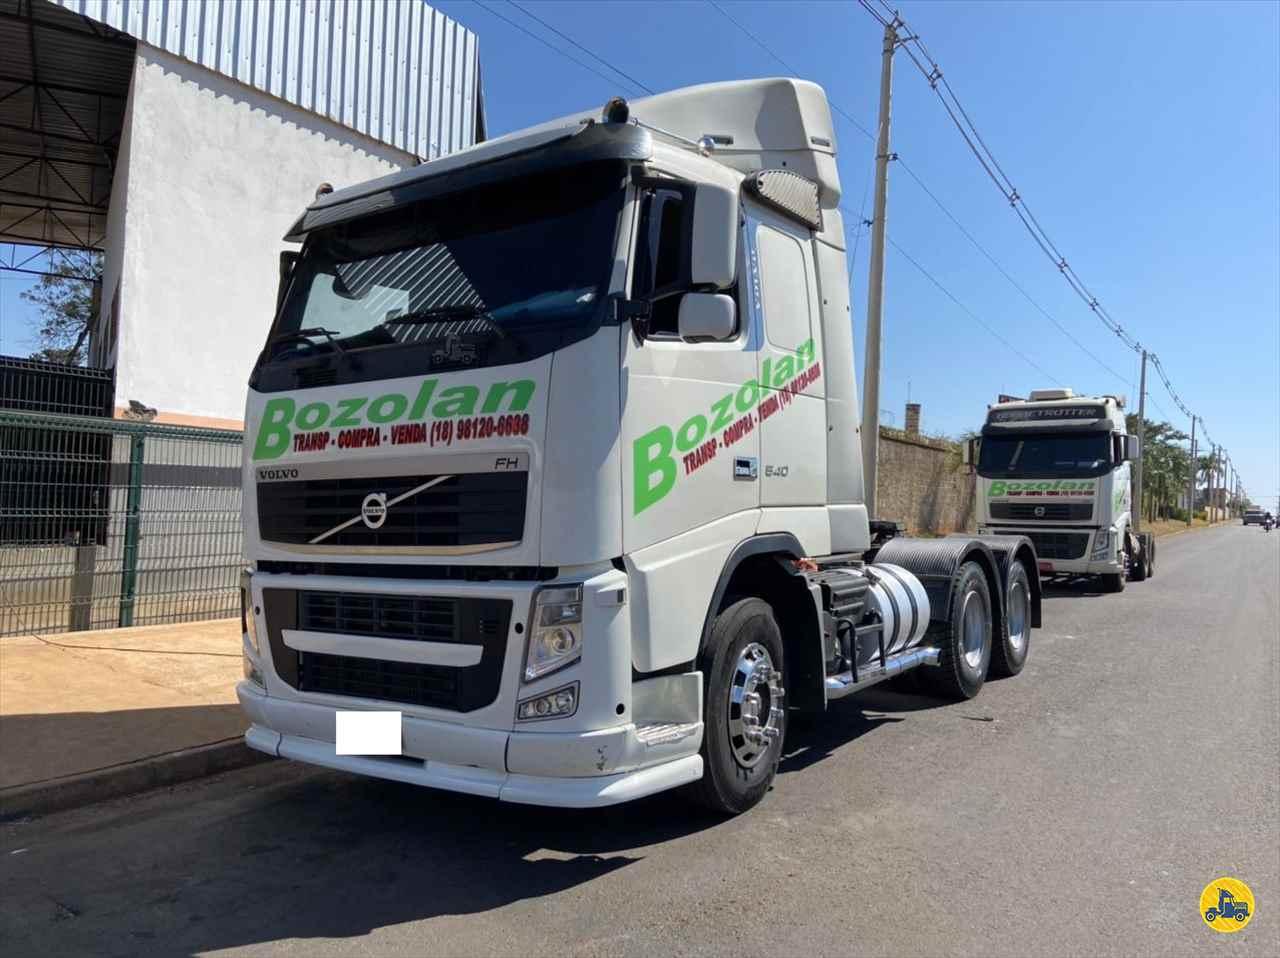 VOLVO VOLVO FH 540  2014/2014 Junior Bozolan Transportes